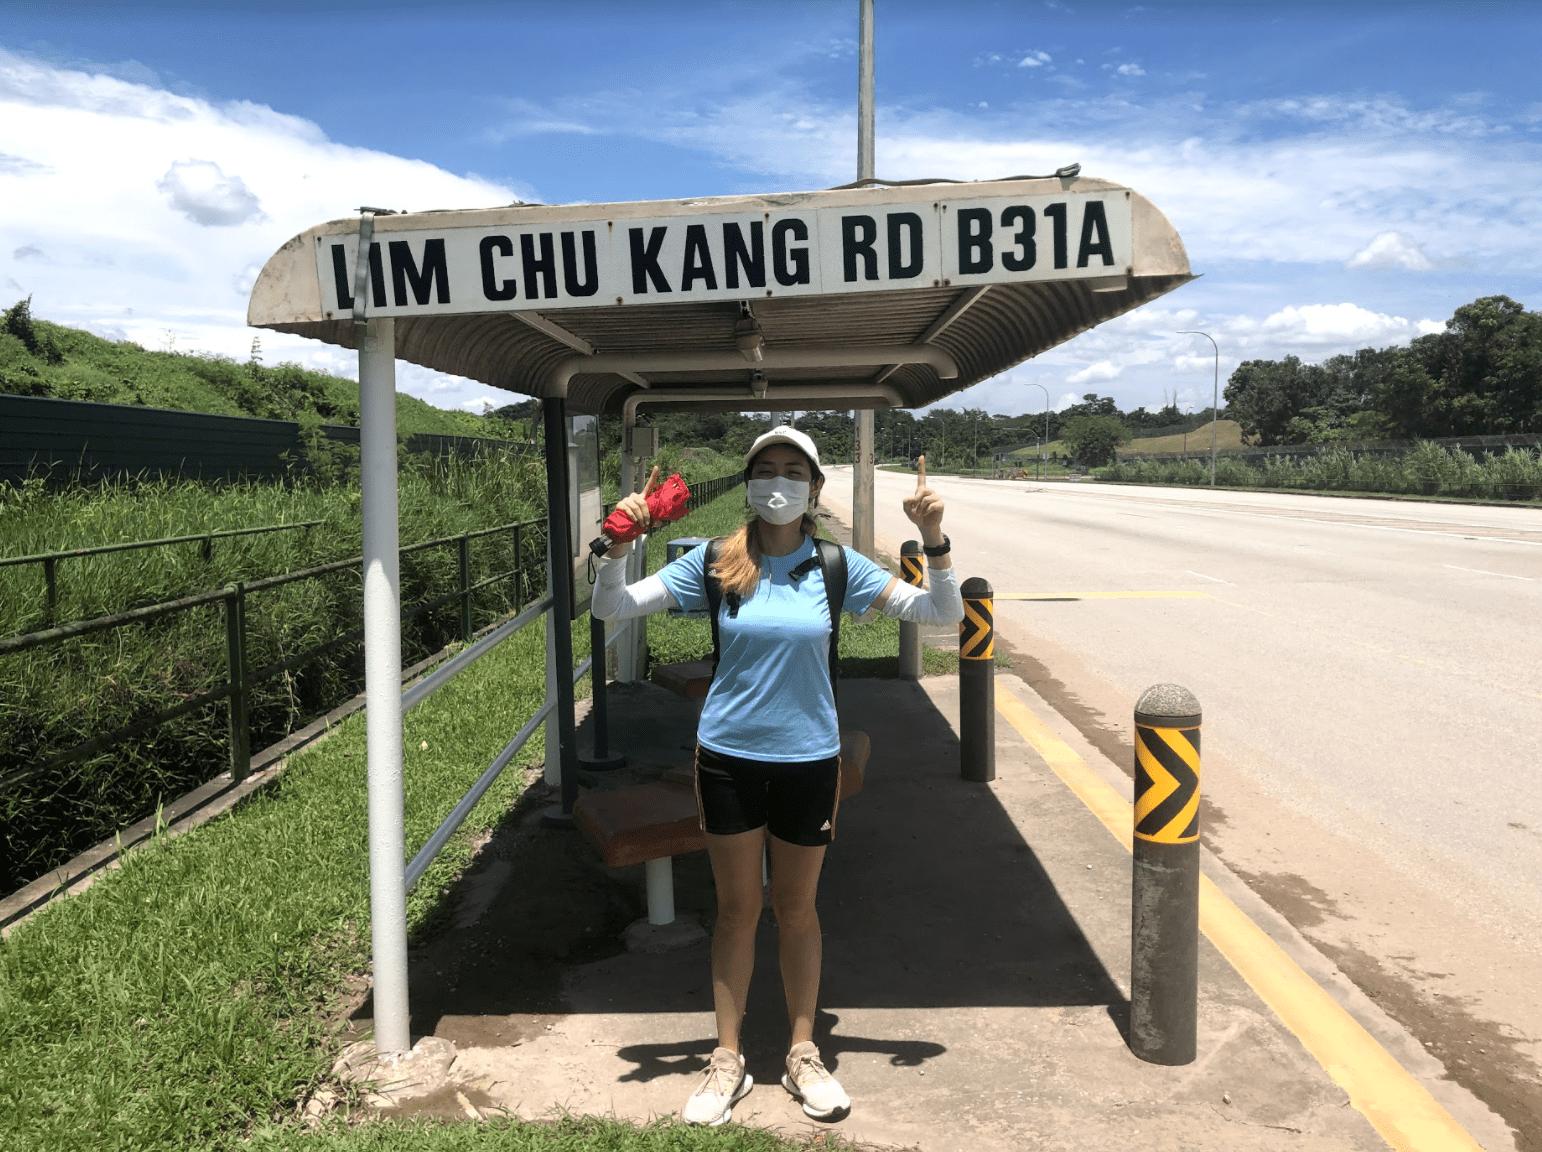 150km singapore walking trail - lim chu kang